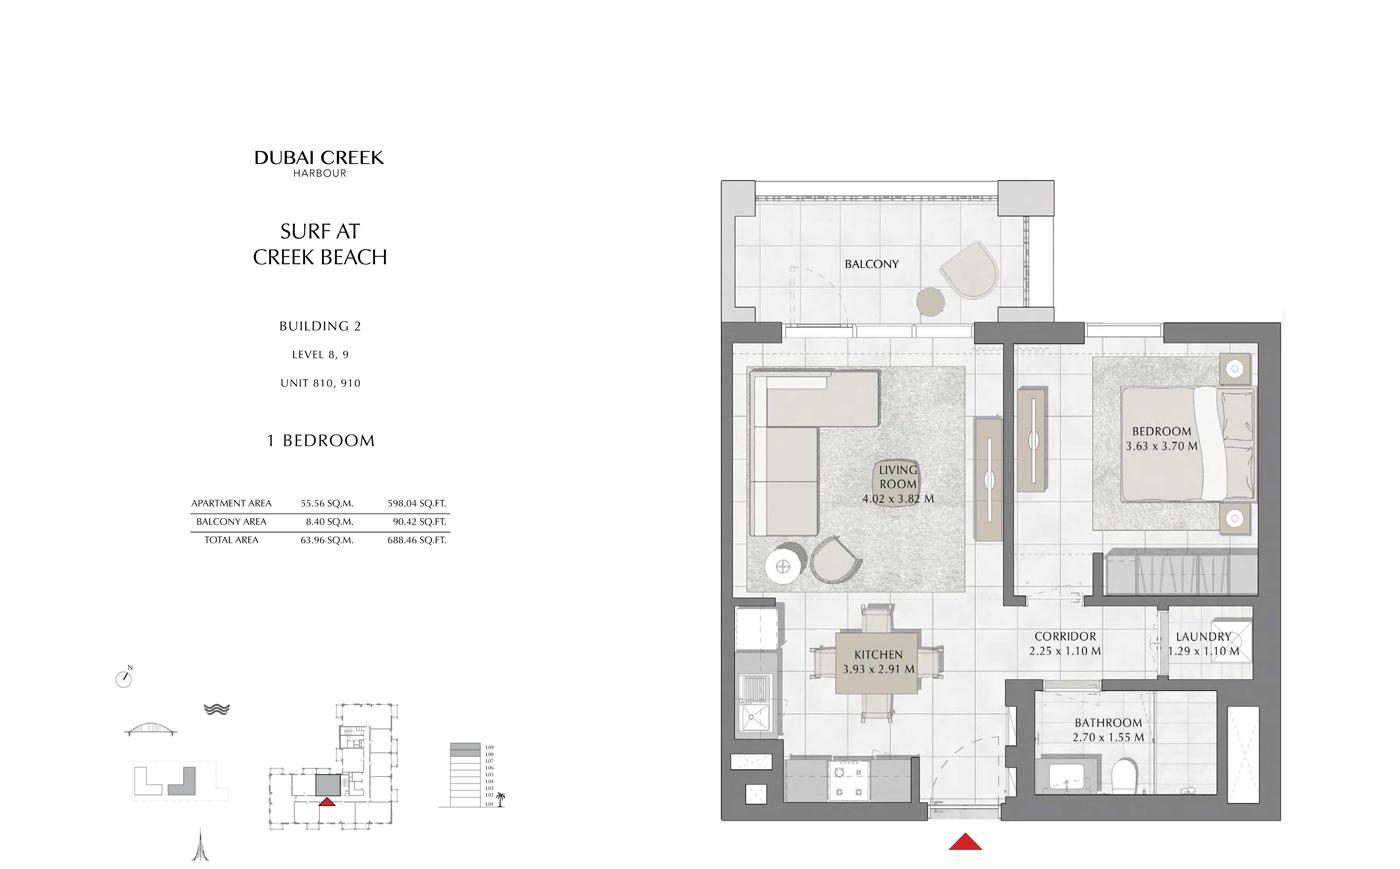 Building 2, 1 Bedroom Level 8, 9, Size 688 Sq Ft